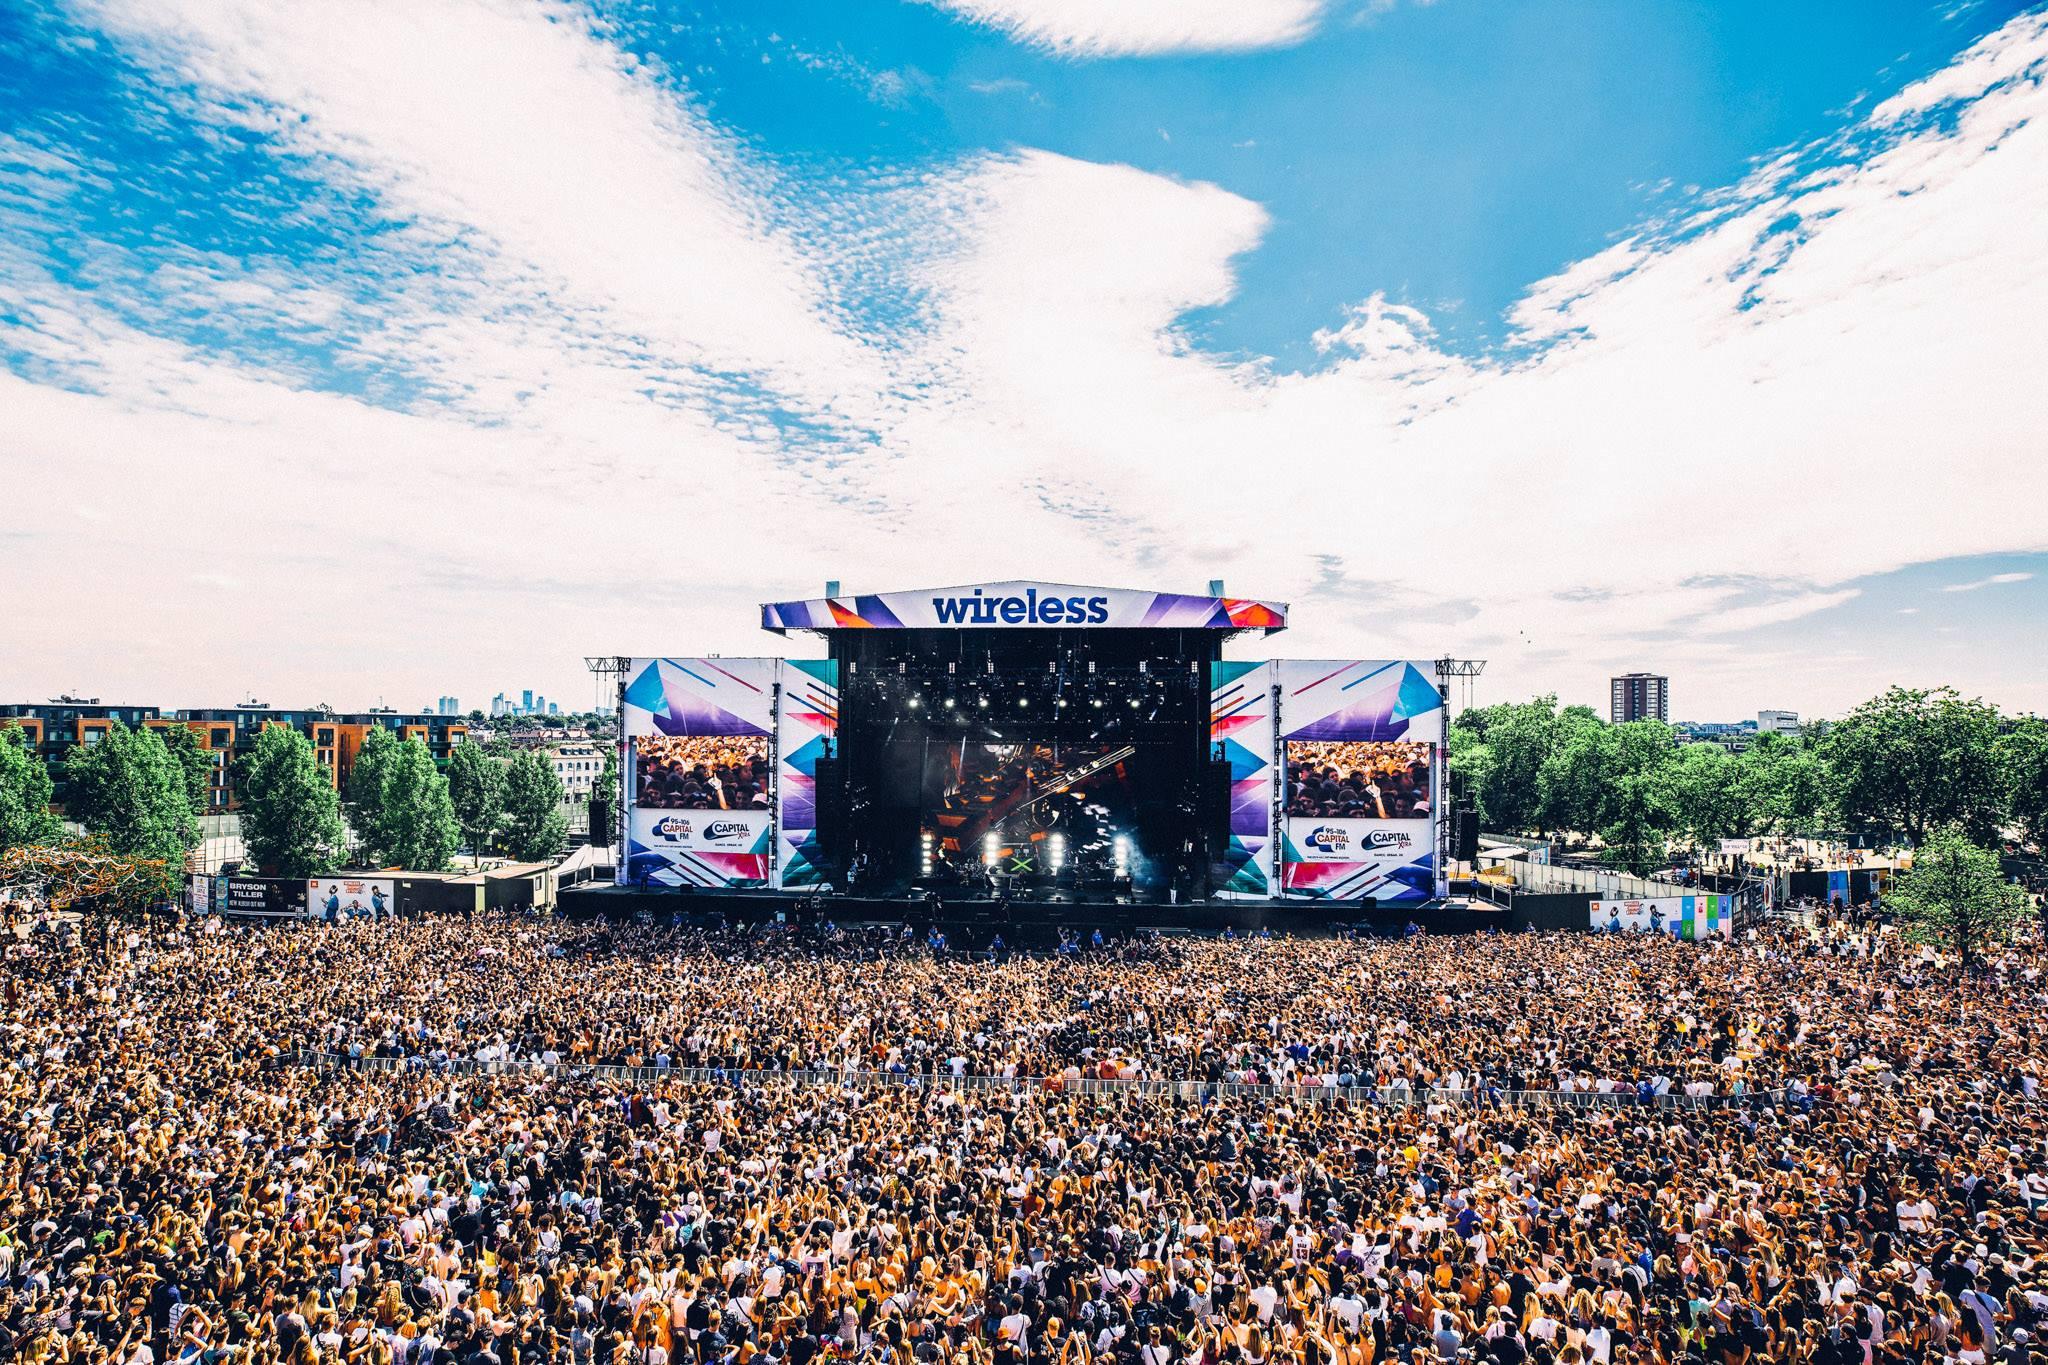 Wireless Festival - Facebook